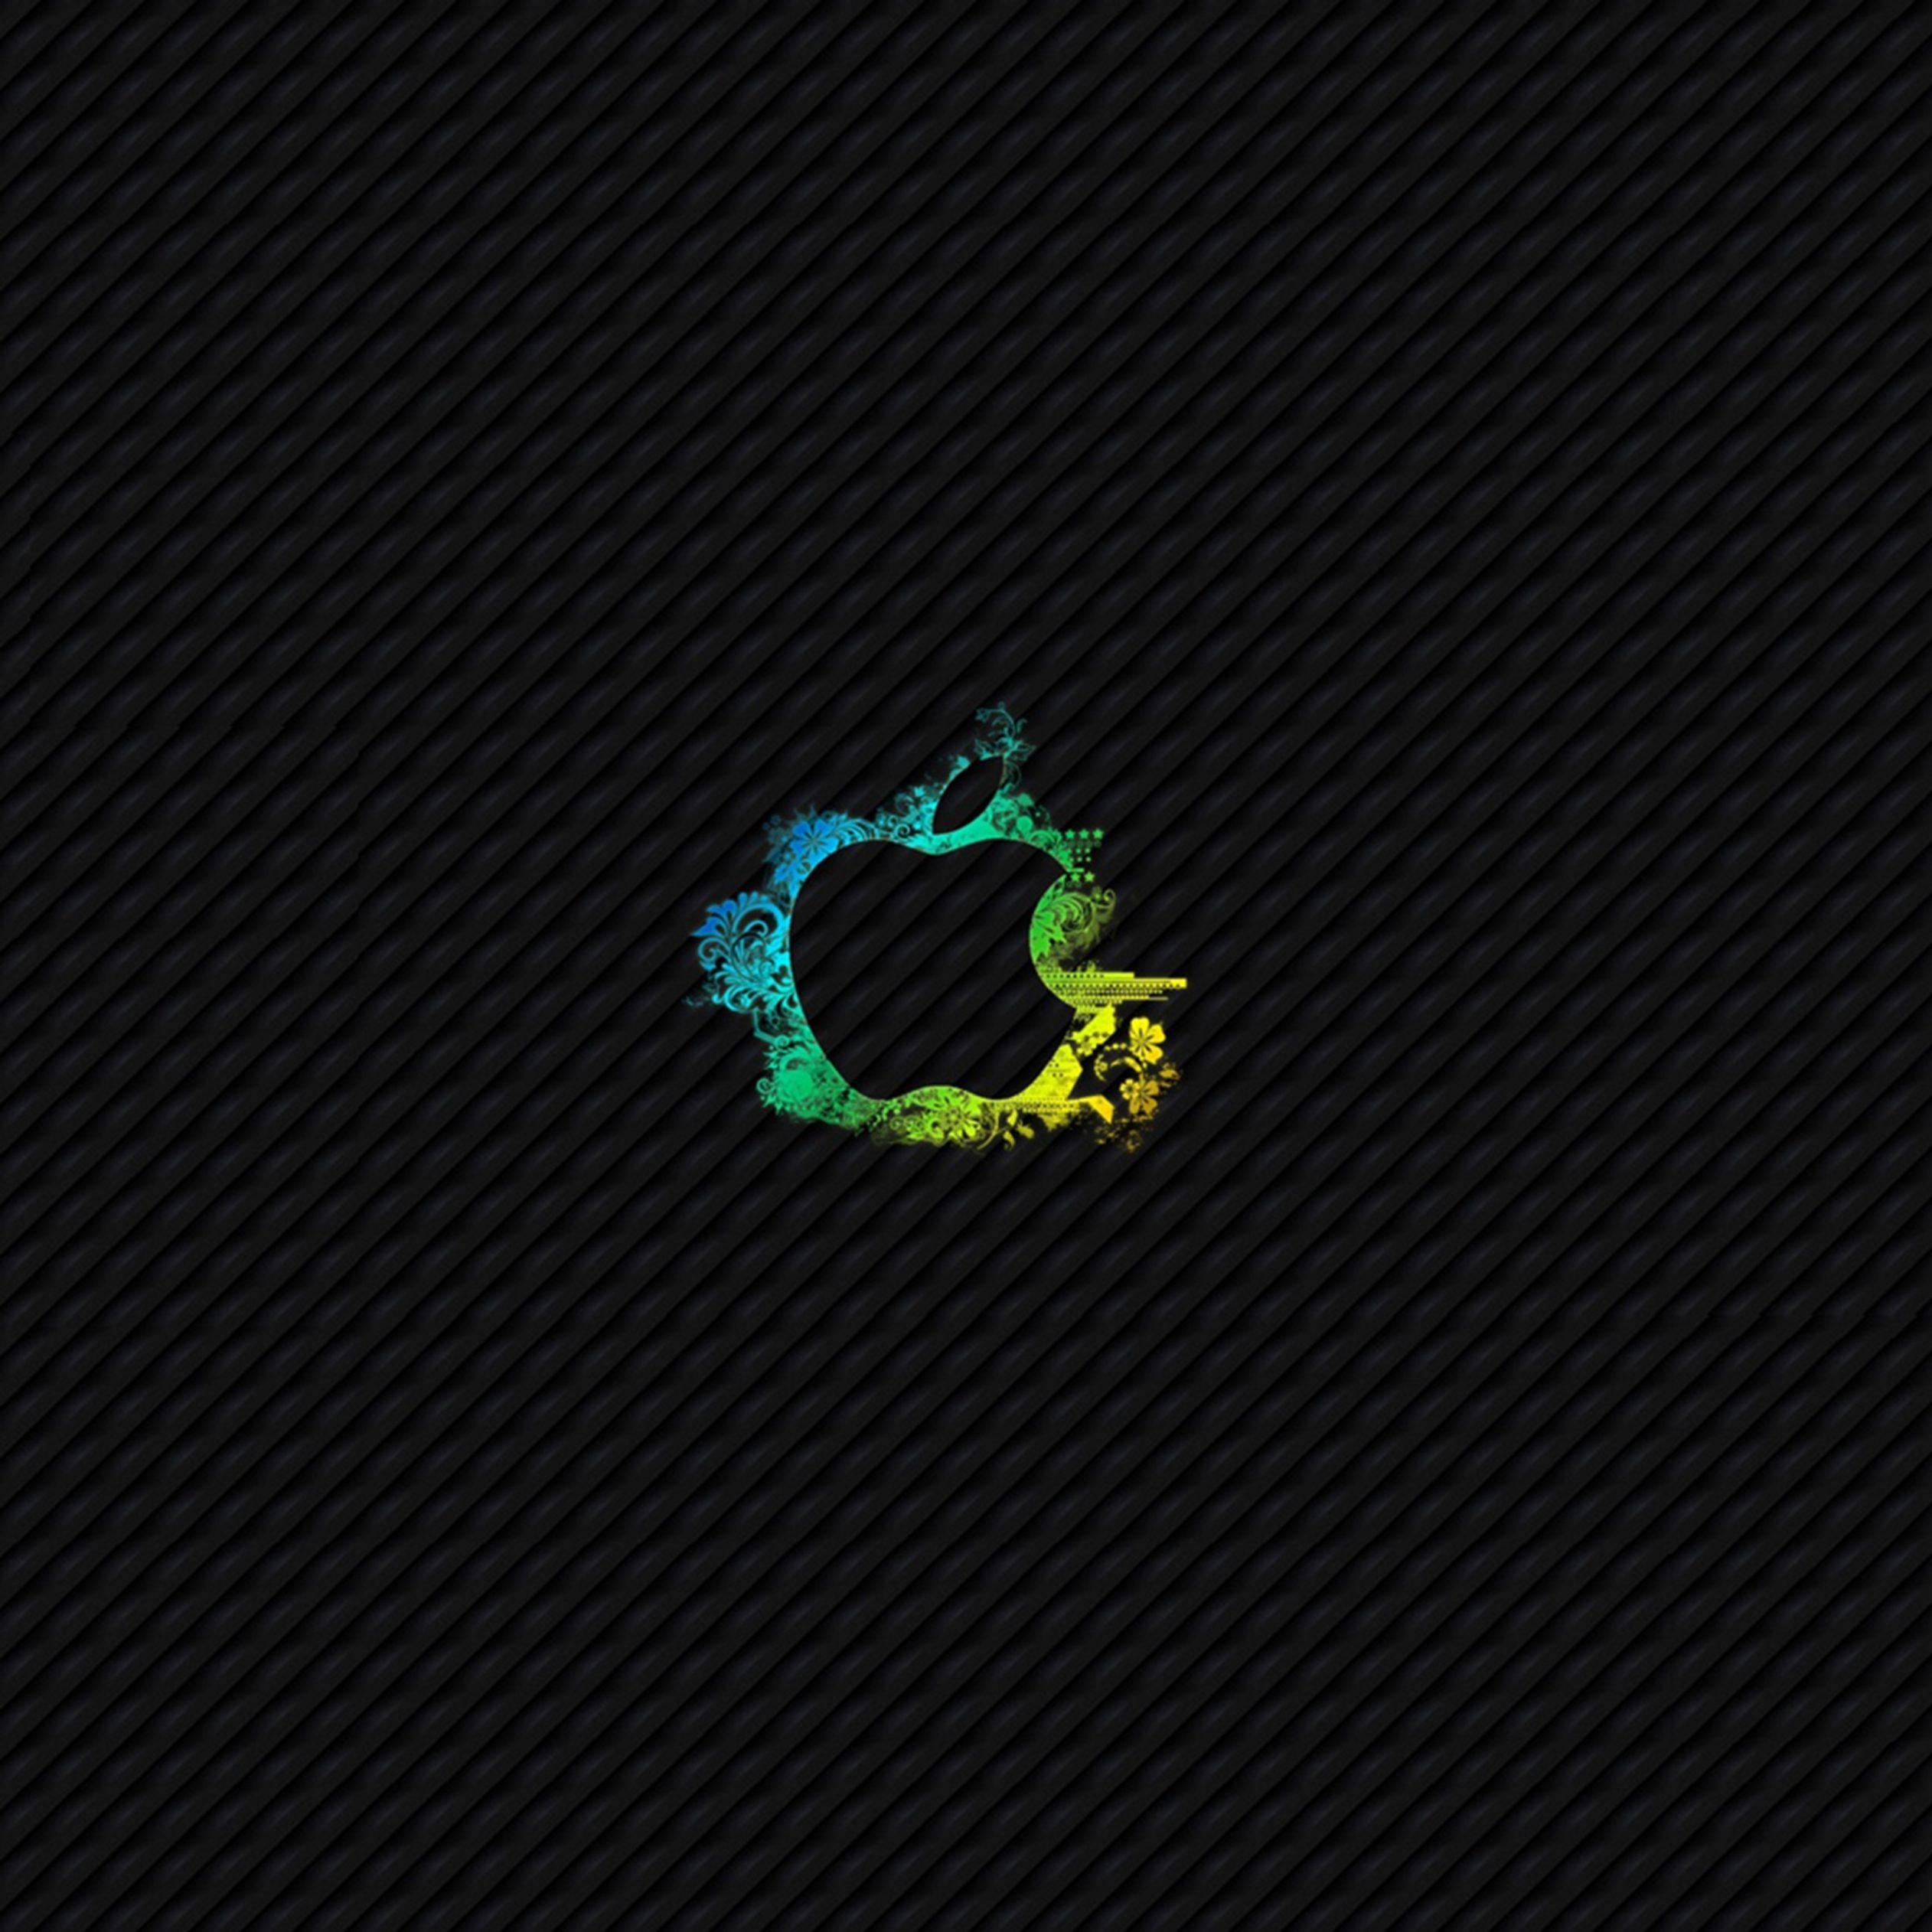 2524x2524 Parallax wallpaper 4k Apple Wallpaper Ipad Wallpaper 2524x2524 pixels resolution